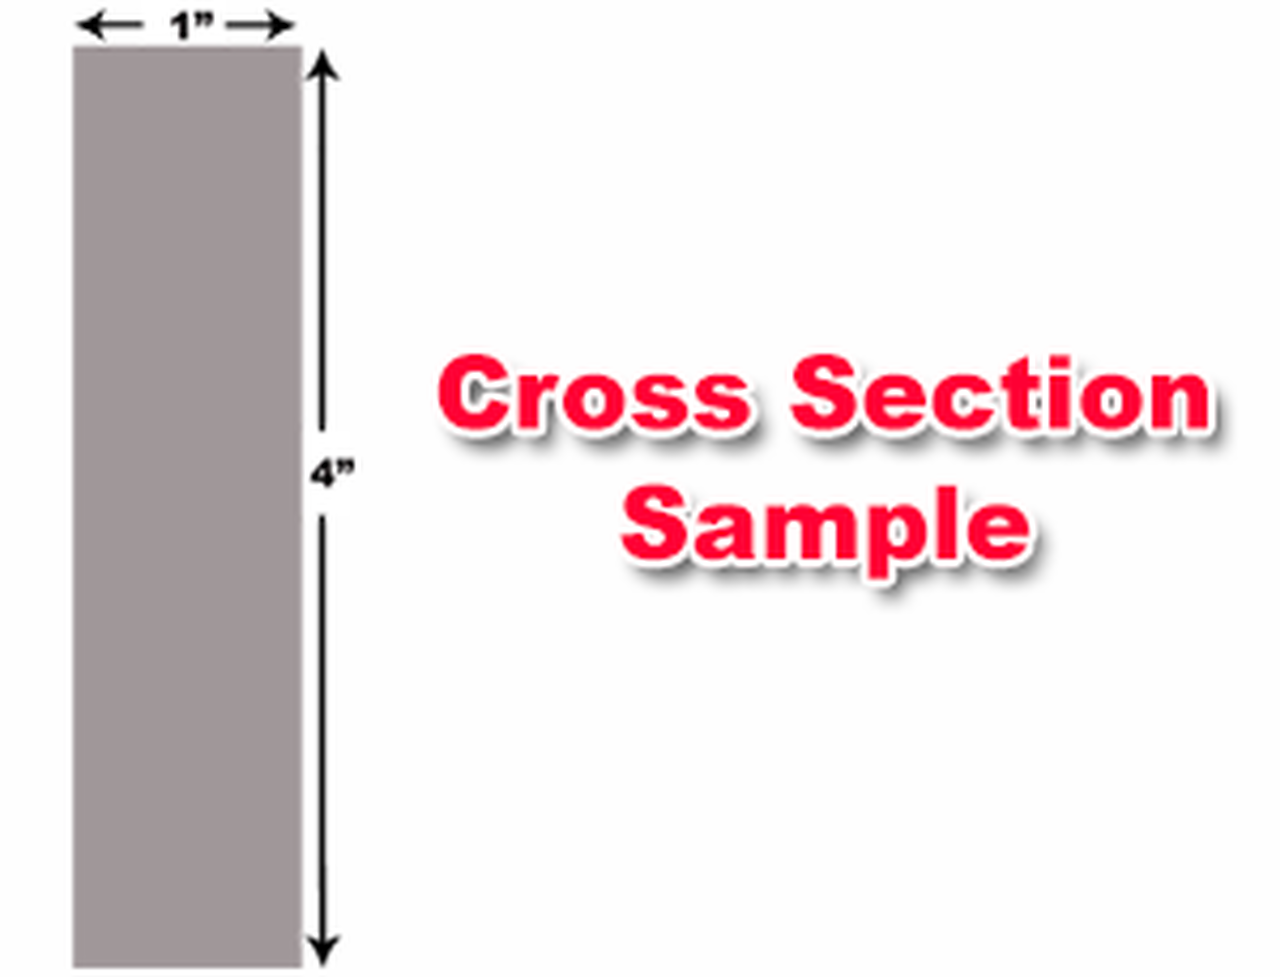 "American Hercules Shear Knives - 100"" Length, 4"" x 1"" Cross Section (239028) Type A"